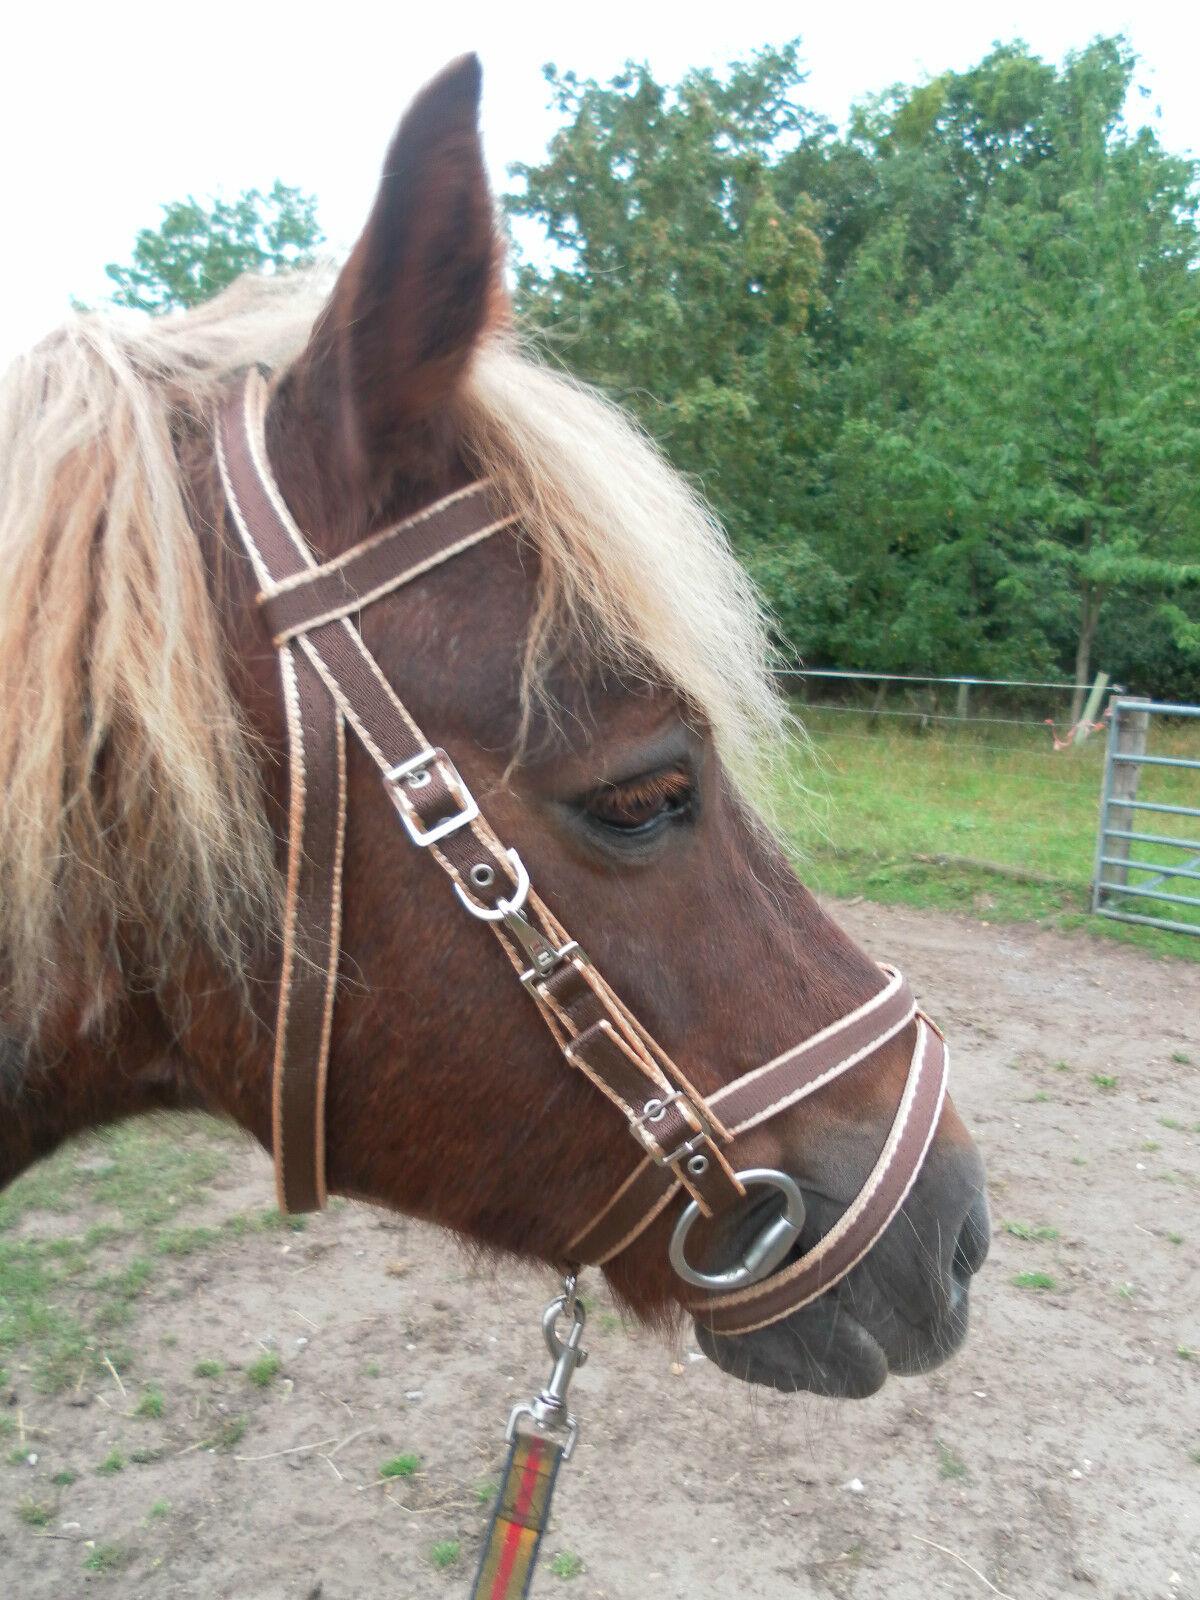 Official Libby's Exmoor Bridle Small Pony Pony Cob  Full Extra Full Horse  considerate service